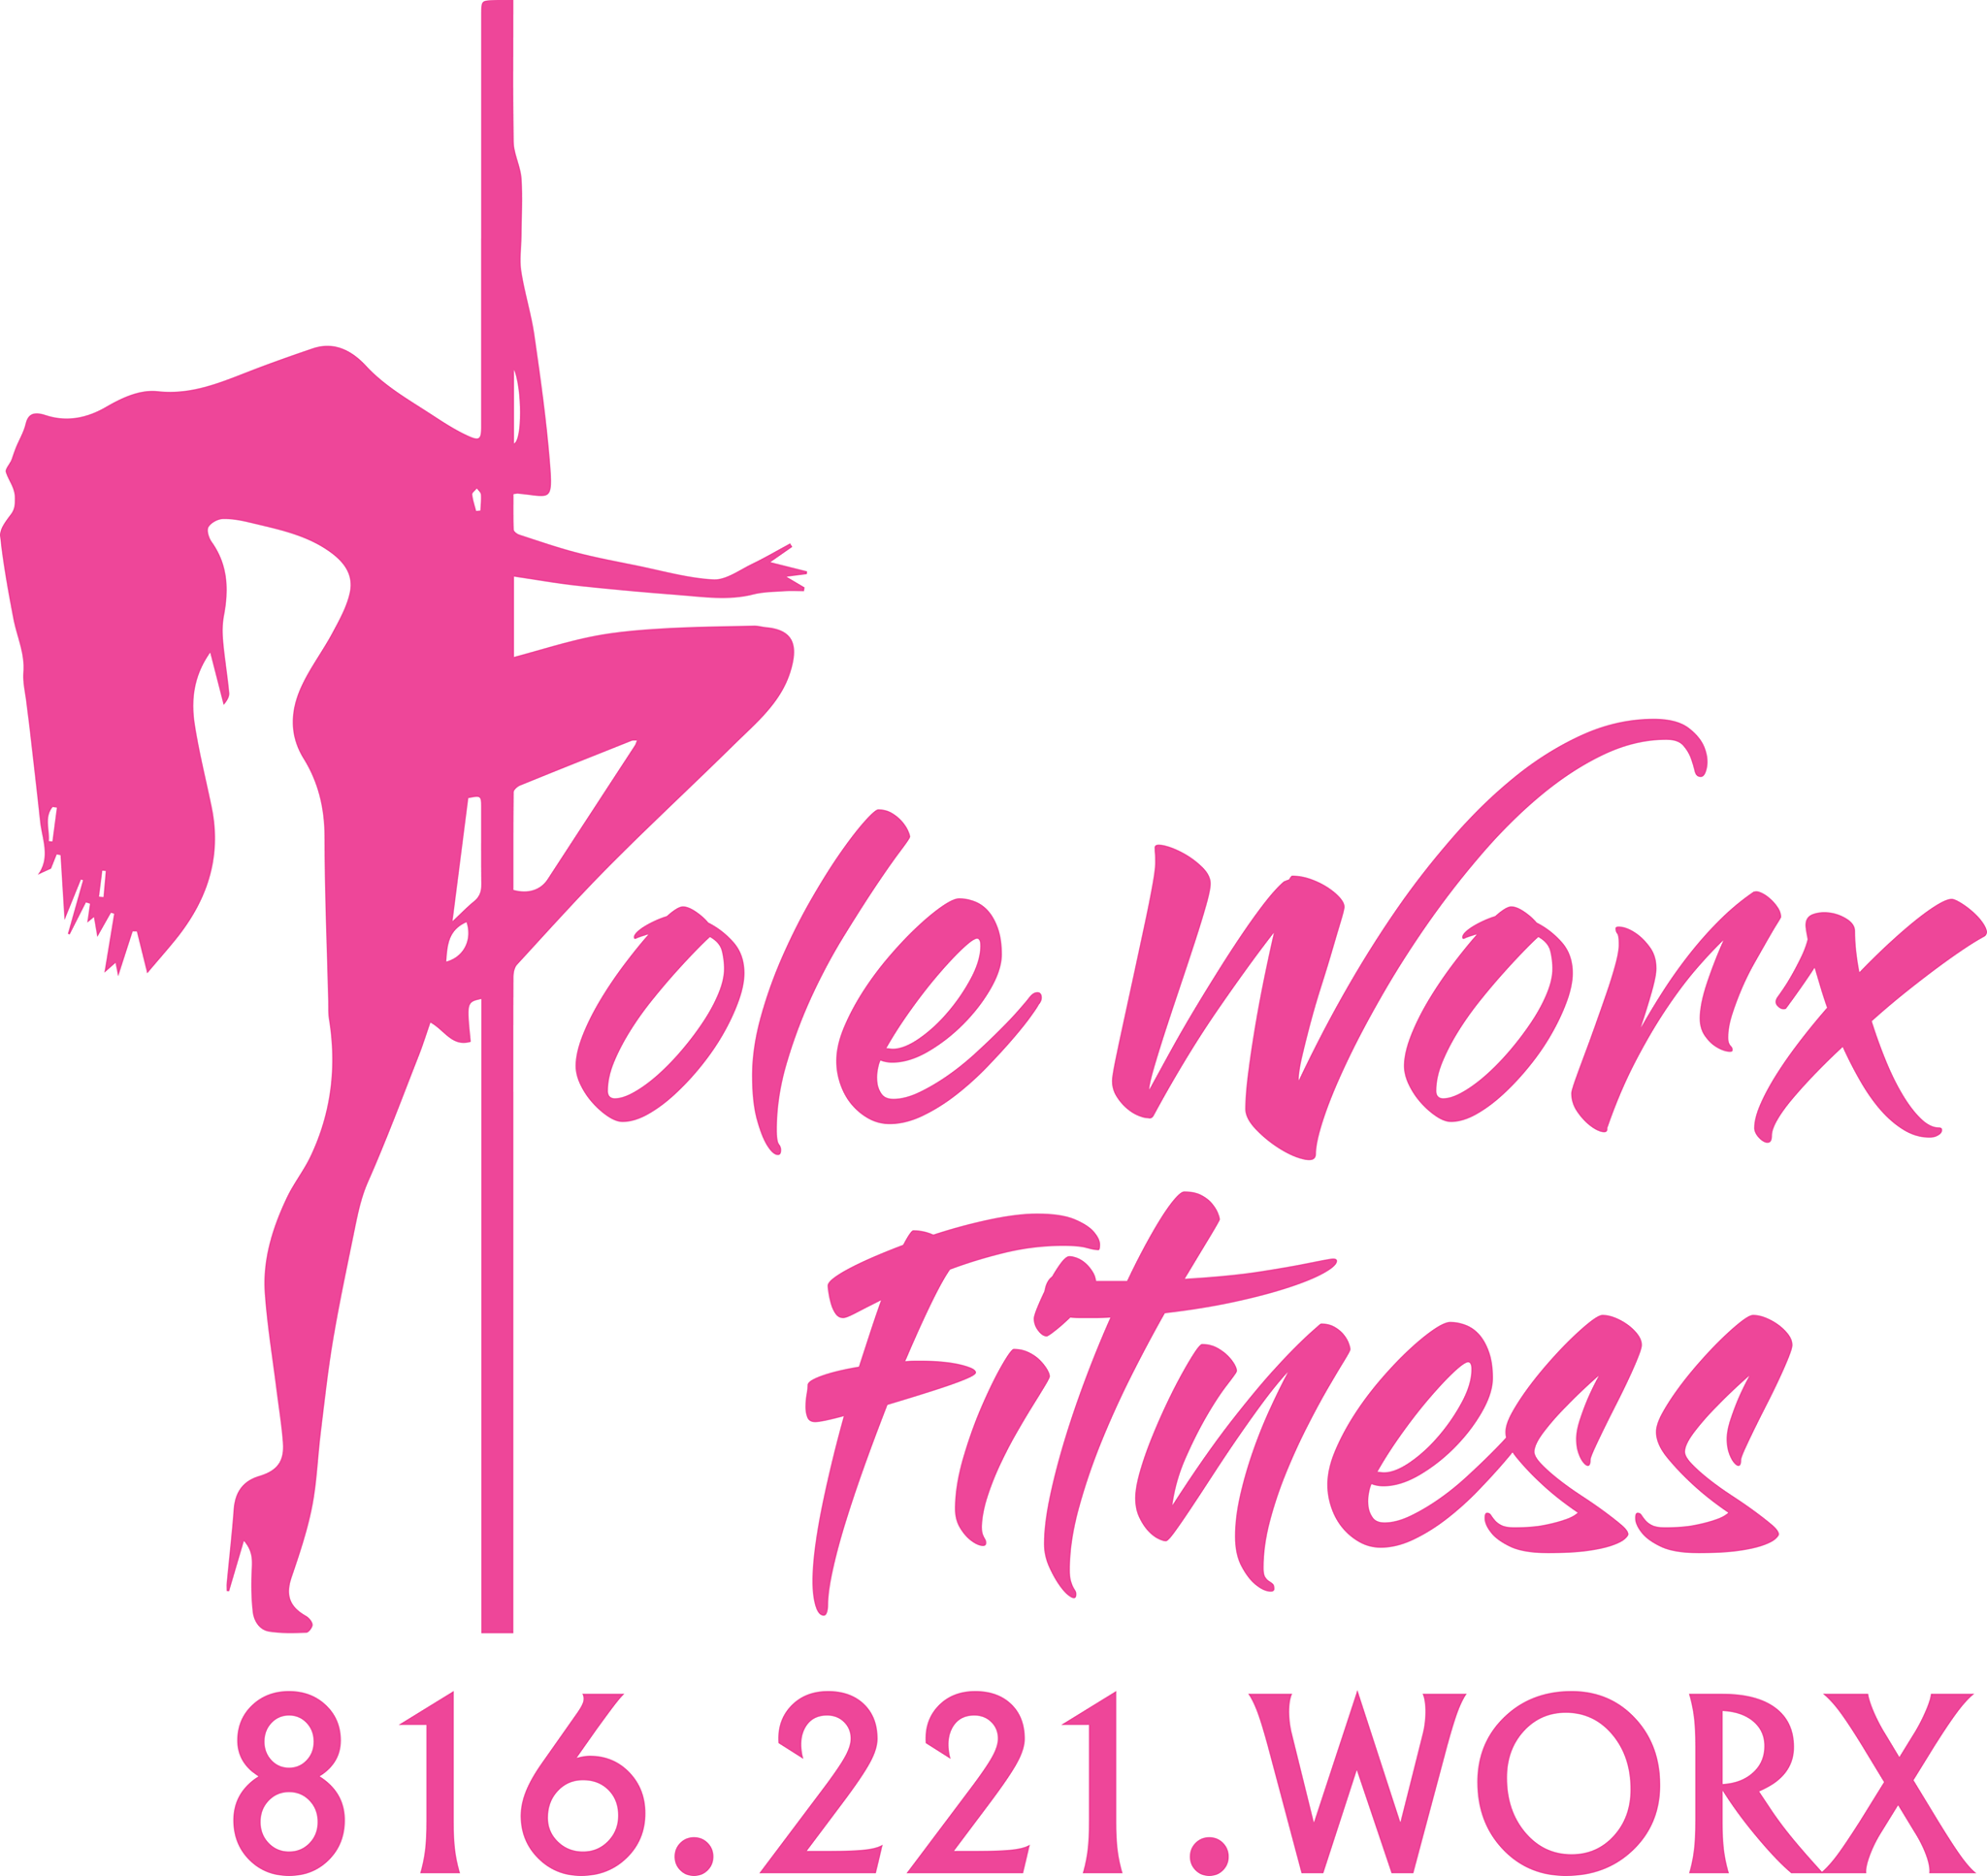 Pole Worx